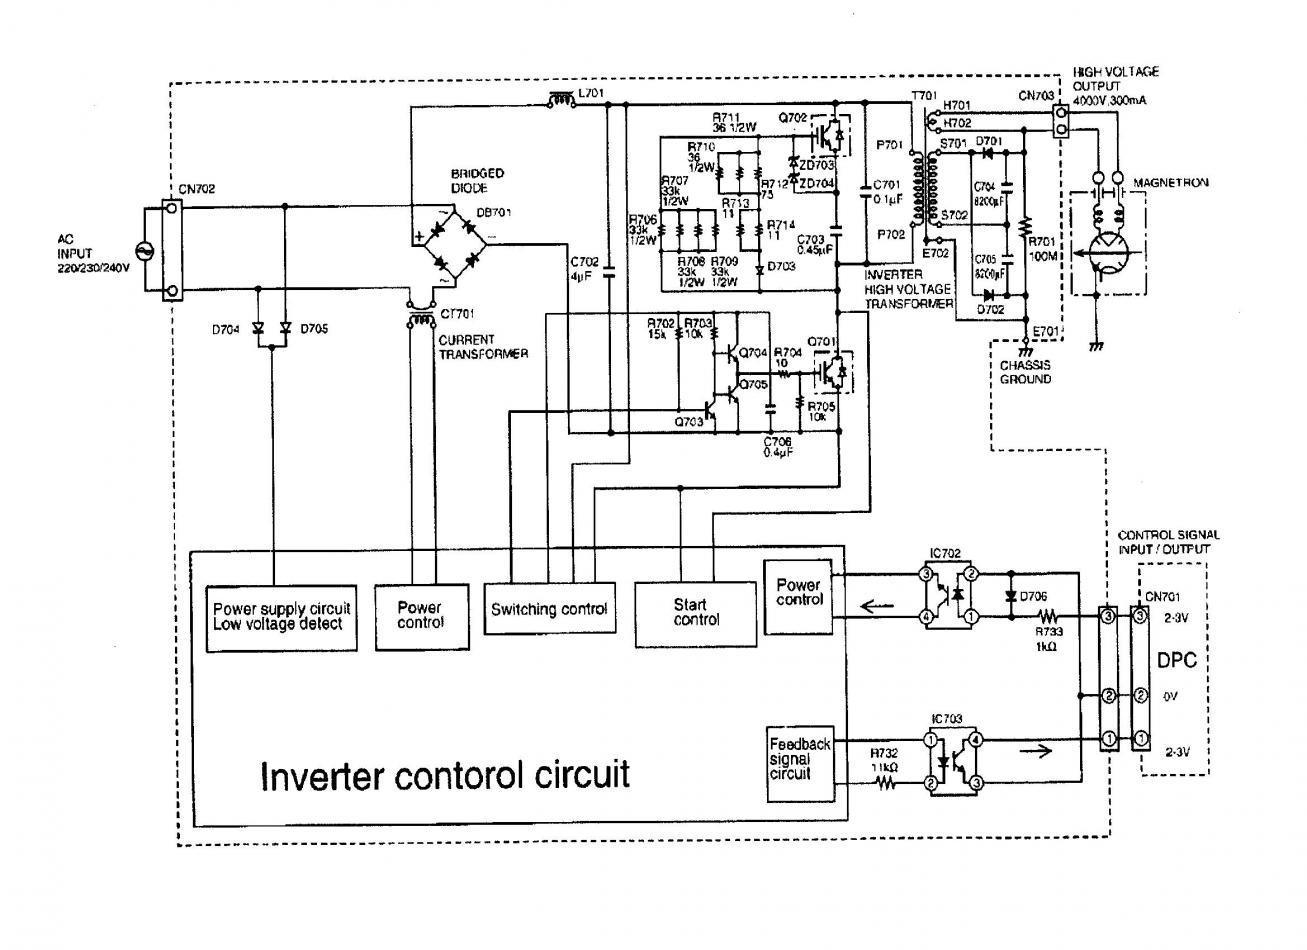 hight resolution of panasonic inverter schematic